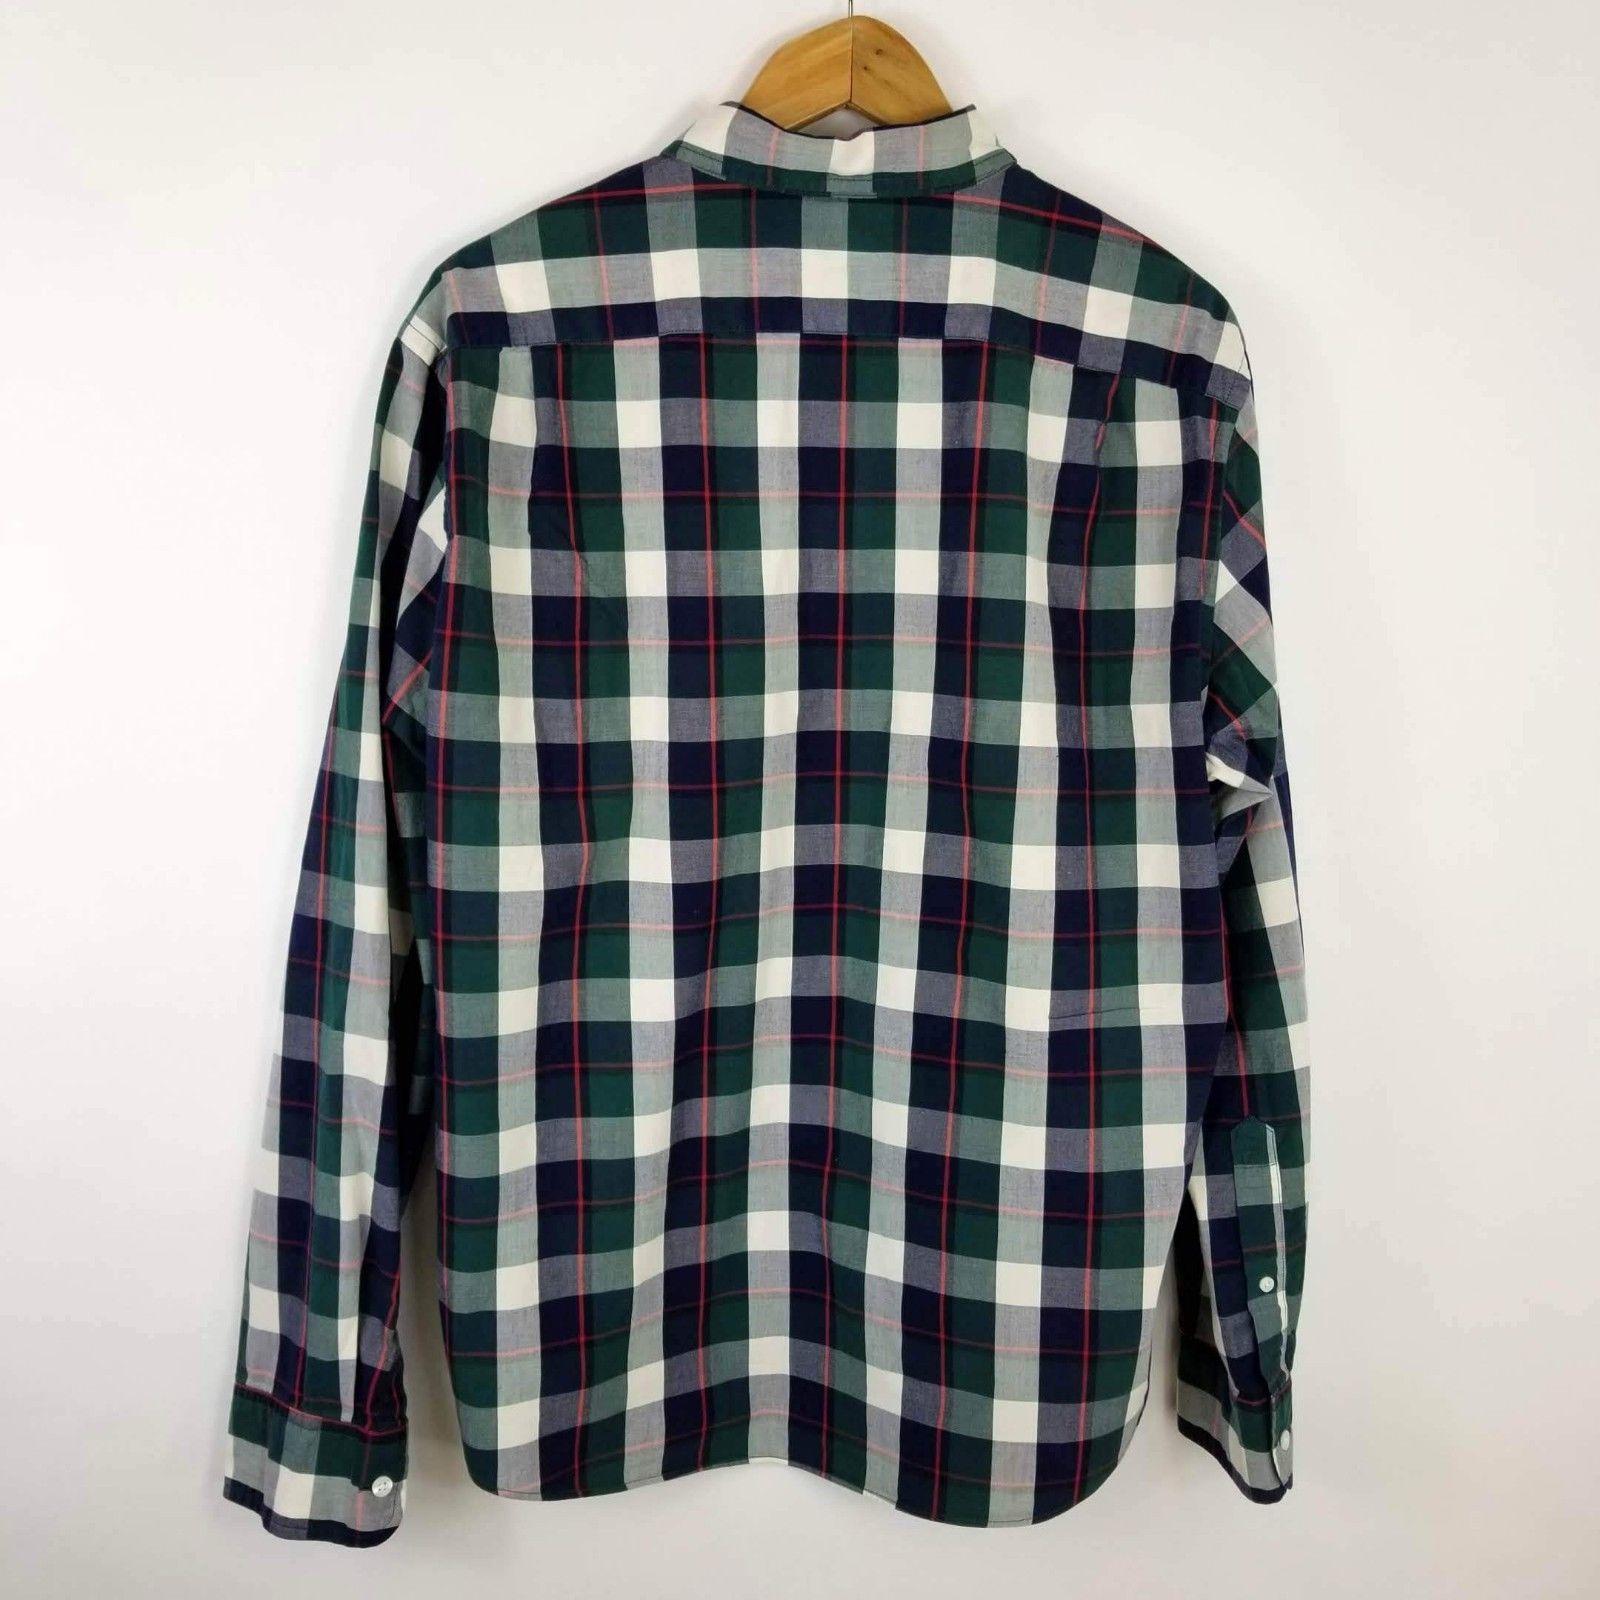 J.CREW Mens Shirt XL Slim Fit Blue Green Plaid Cotton - (SKU:B17)